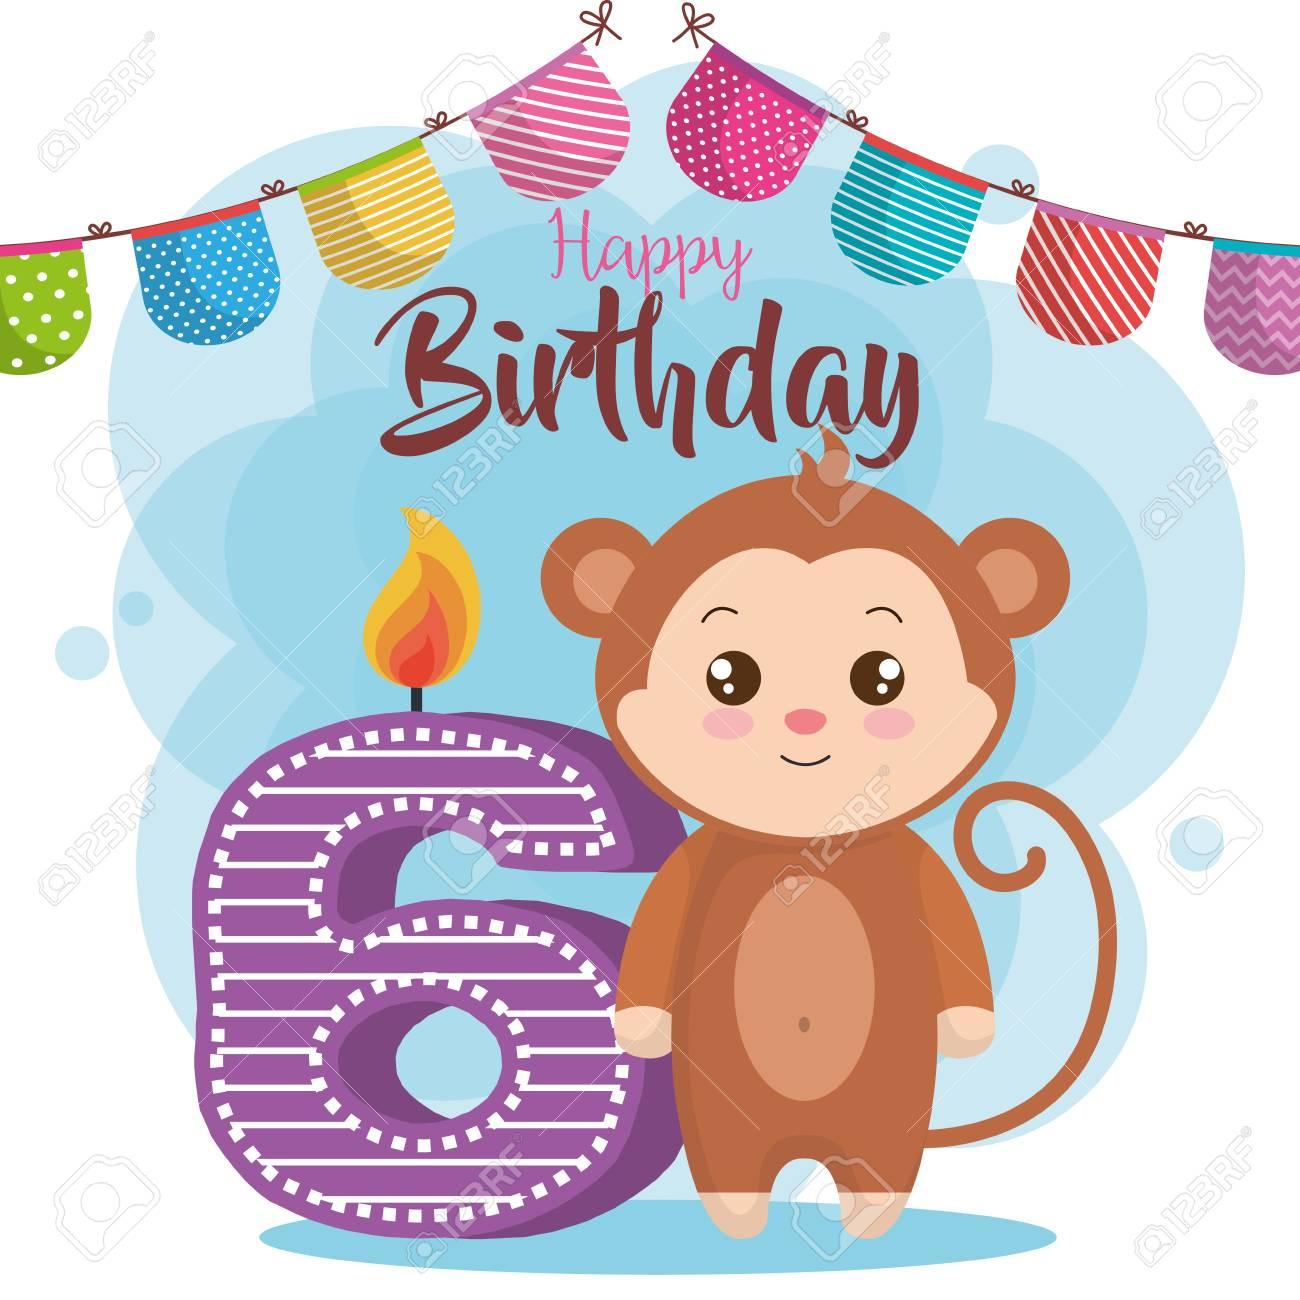 Happy Birthday Card With Monkey Vector Illustration Design Stock